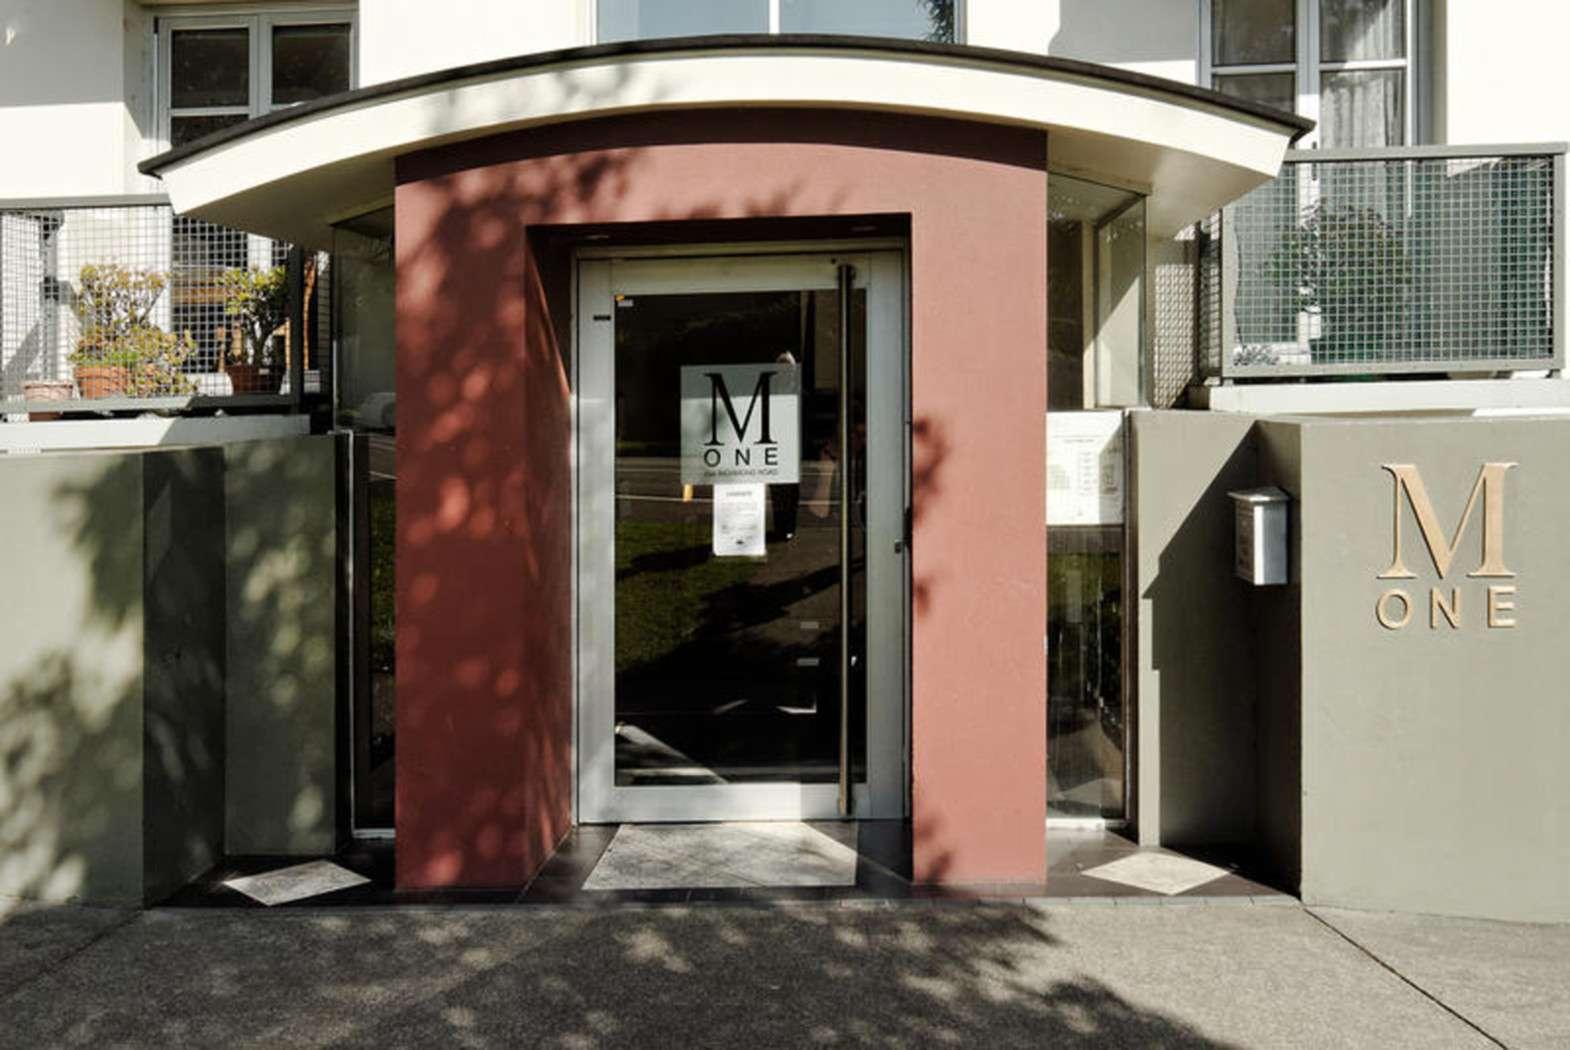 GD/250 Richmond Road, GREY LYNN, Auckland City 1021